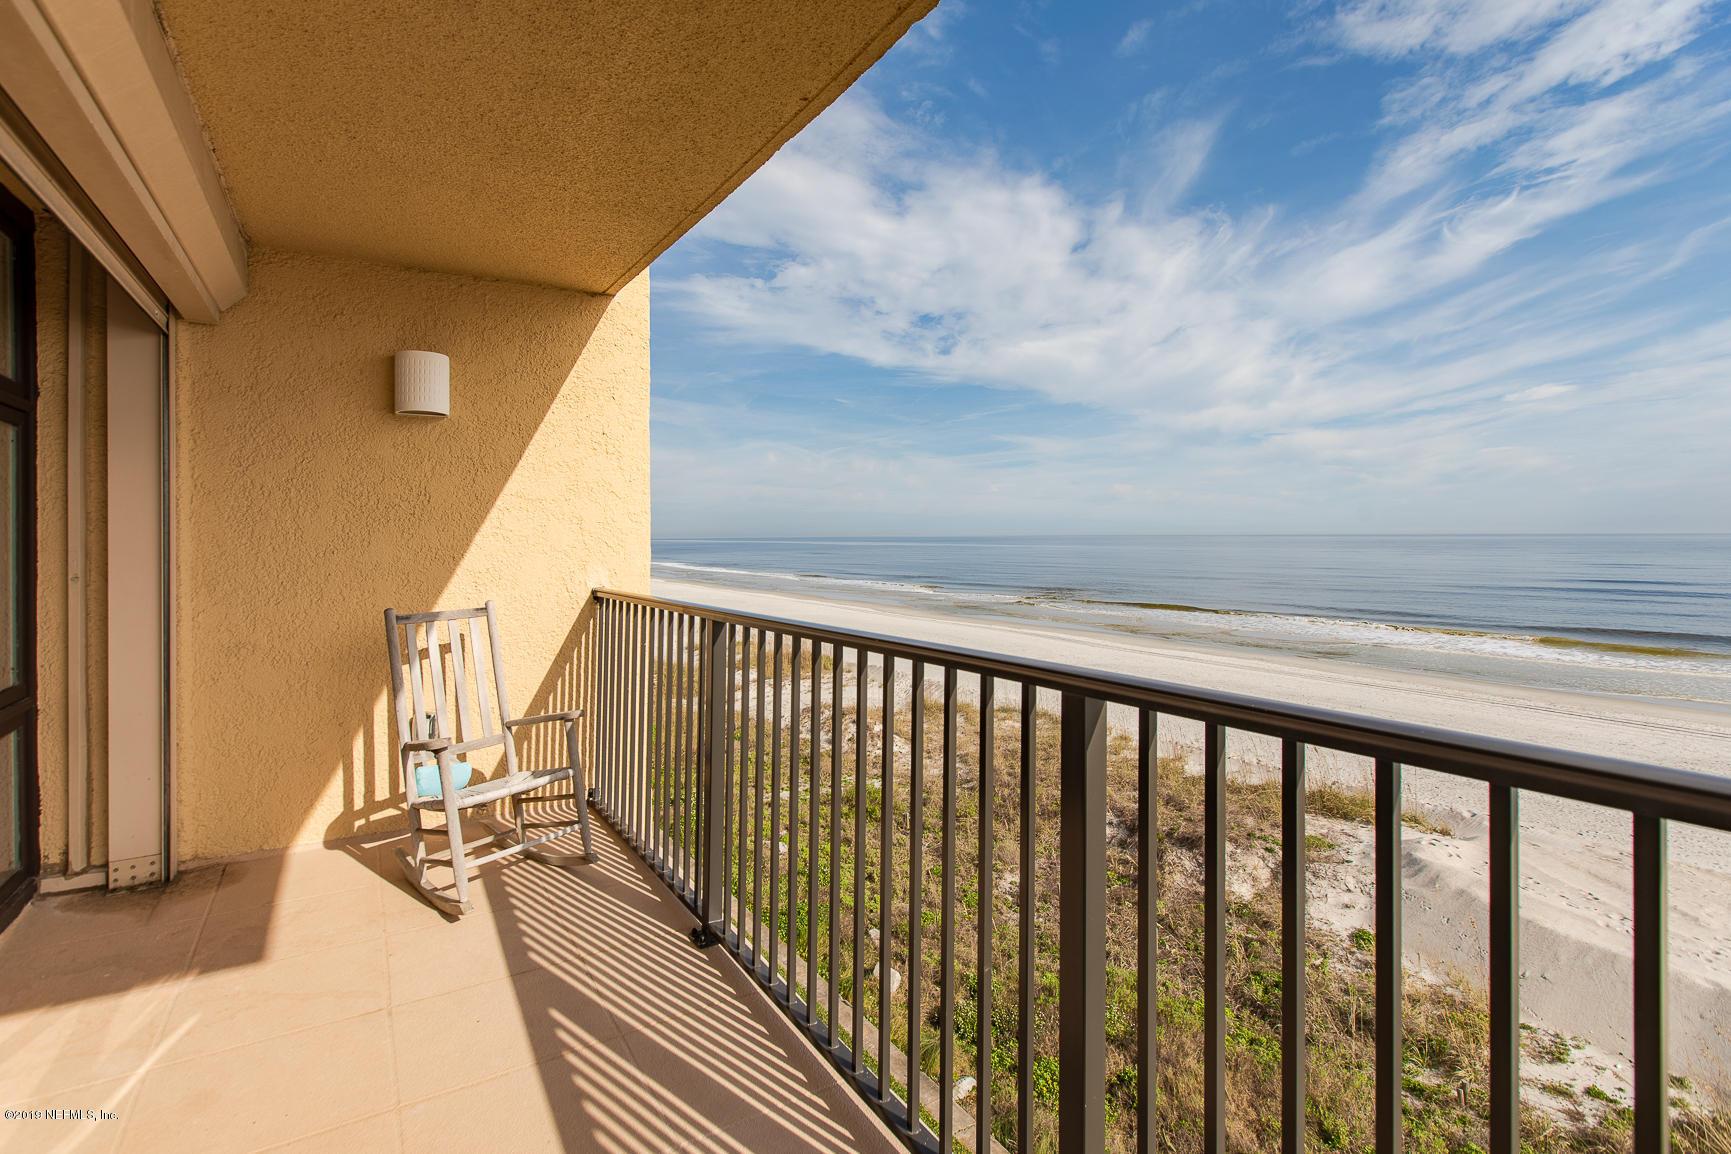 2200 OCEAN- JACKSONVILLE BEACH- FLORIDA 32250, 3 Bedrooms Bedrooms, ,2 BathroomsBathrooms,Condo,For sale,OCEAN,981513